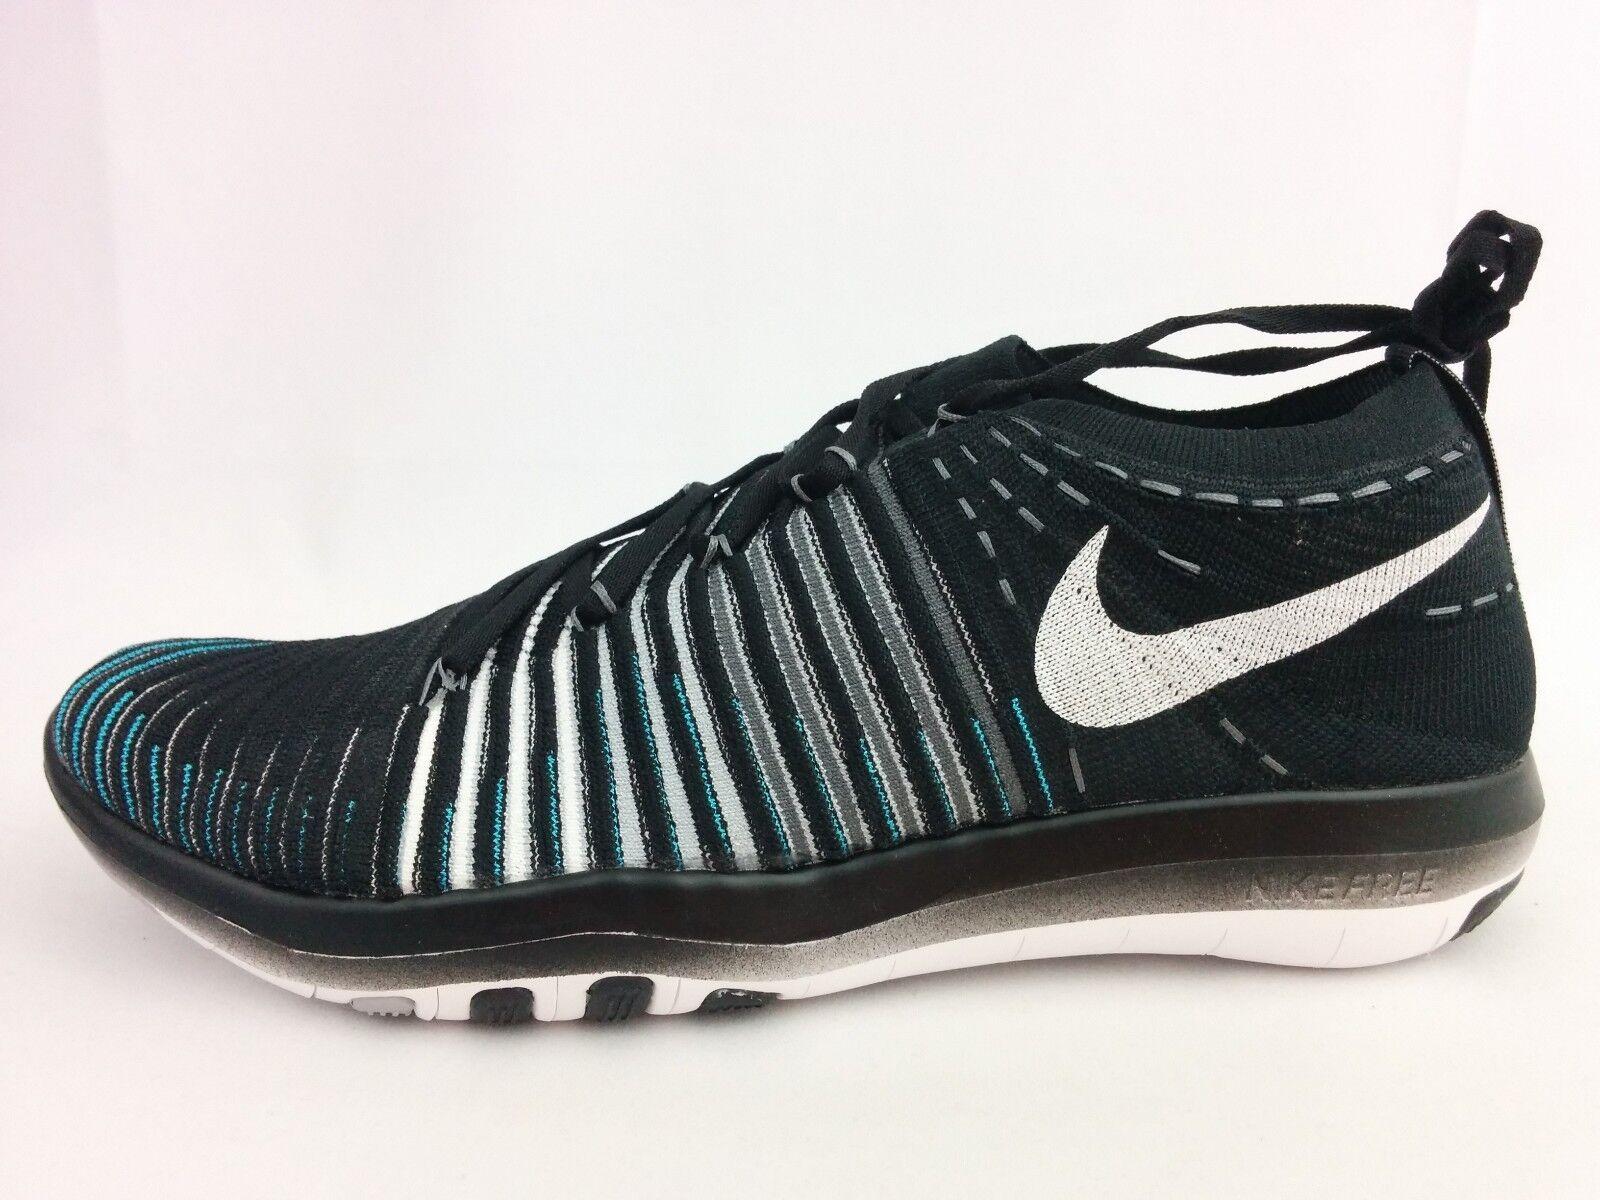 WMNS Nike Transform Flyknit Black White Womens Training Trainers 833410-001  11 | eBay